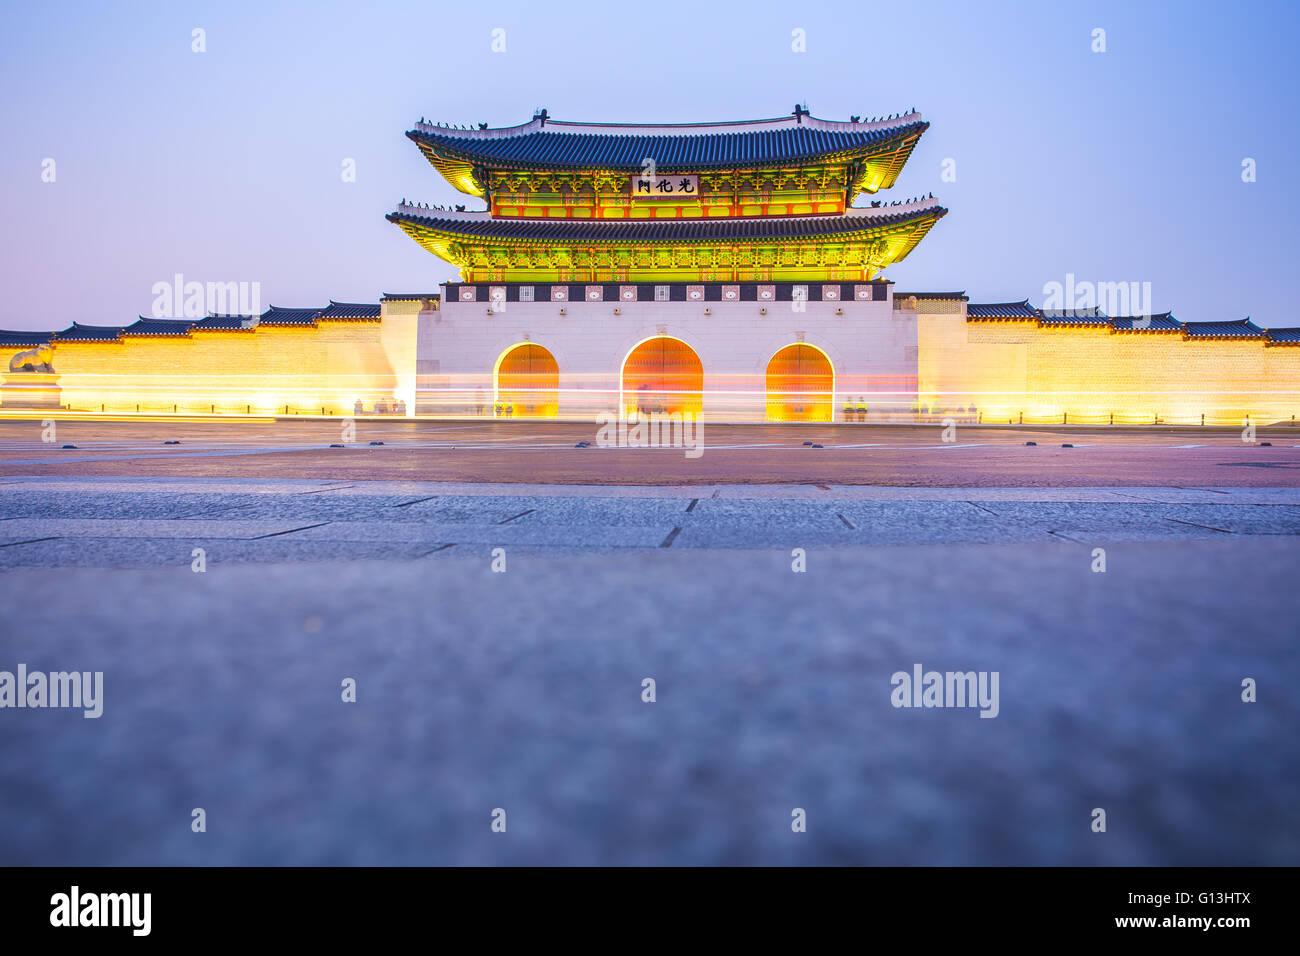 Nacht im Gyeongbokgung Palace in Seoul, Südkorea. Stockbild